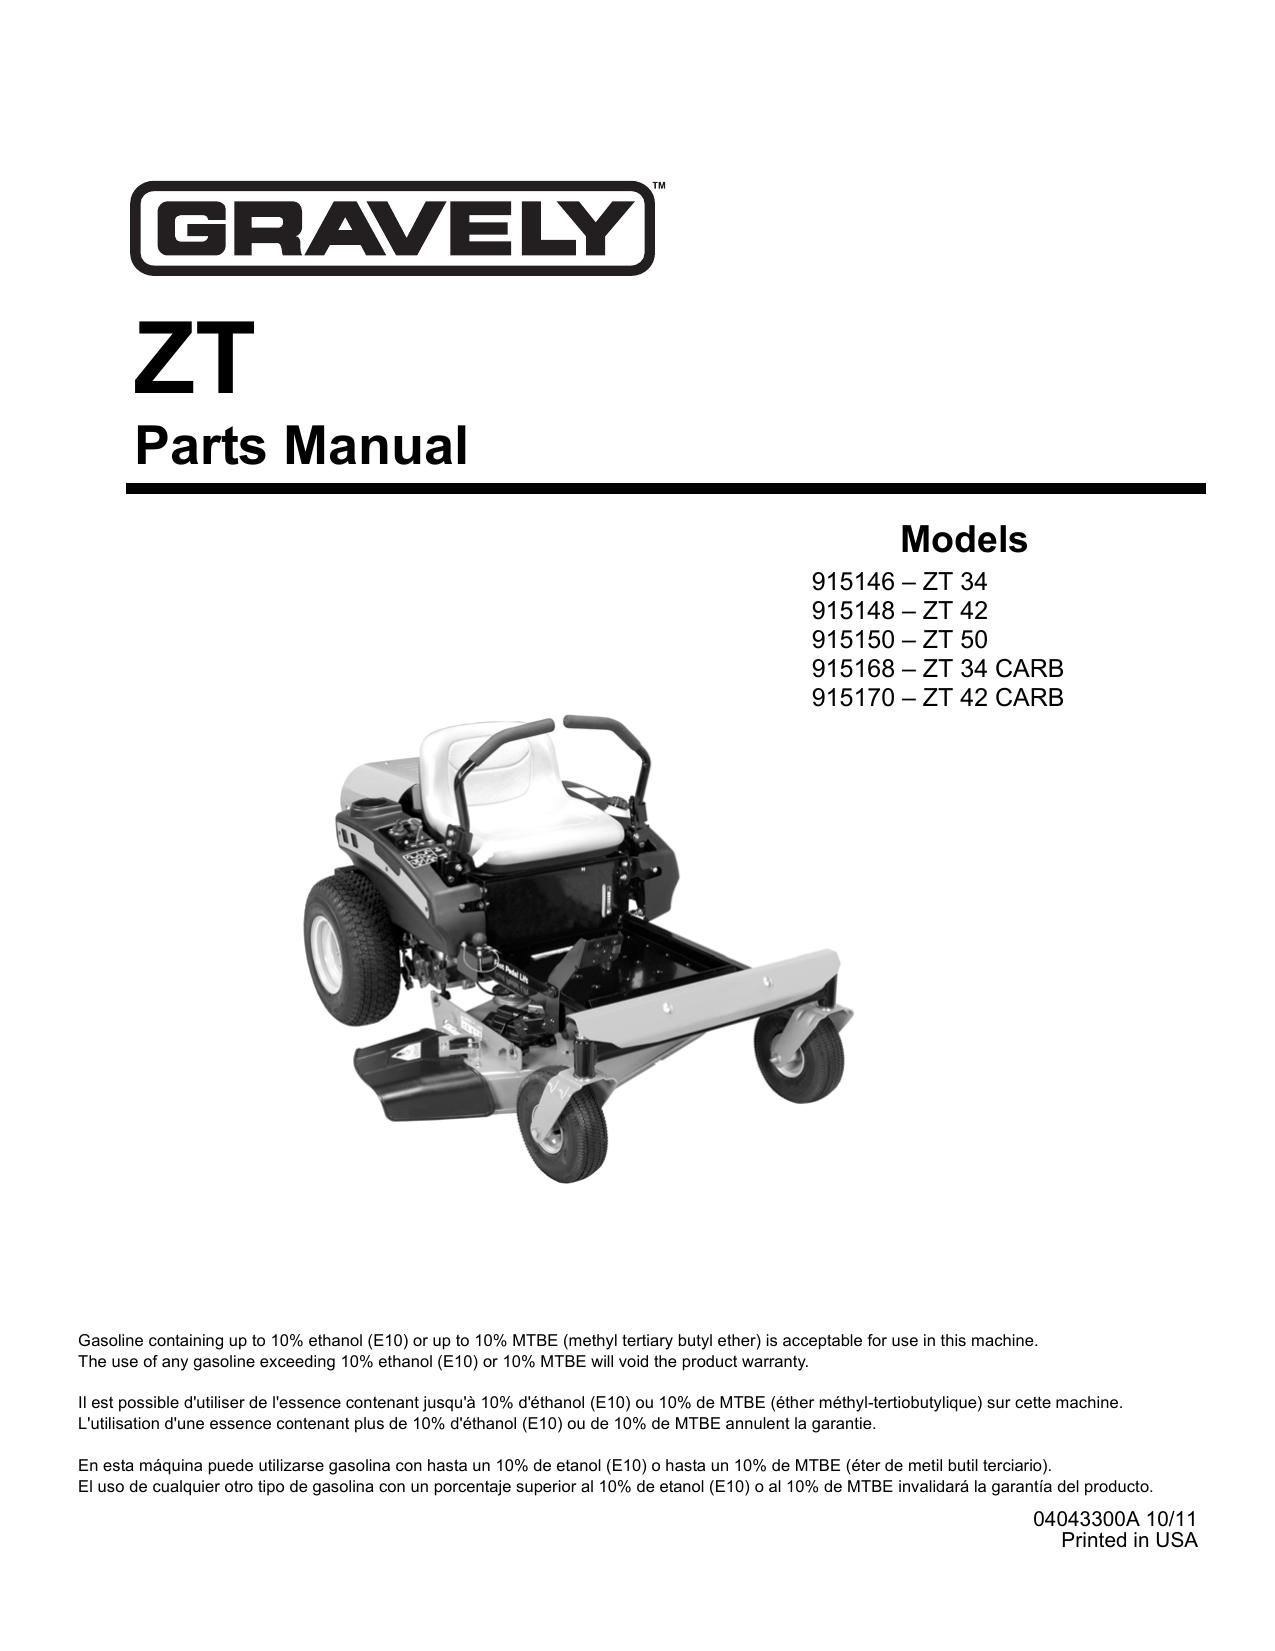 Gravely Lawn Mower 915146 ZT 34 User manual | manualzz com